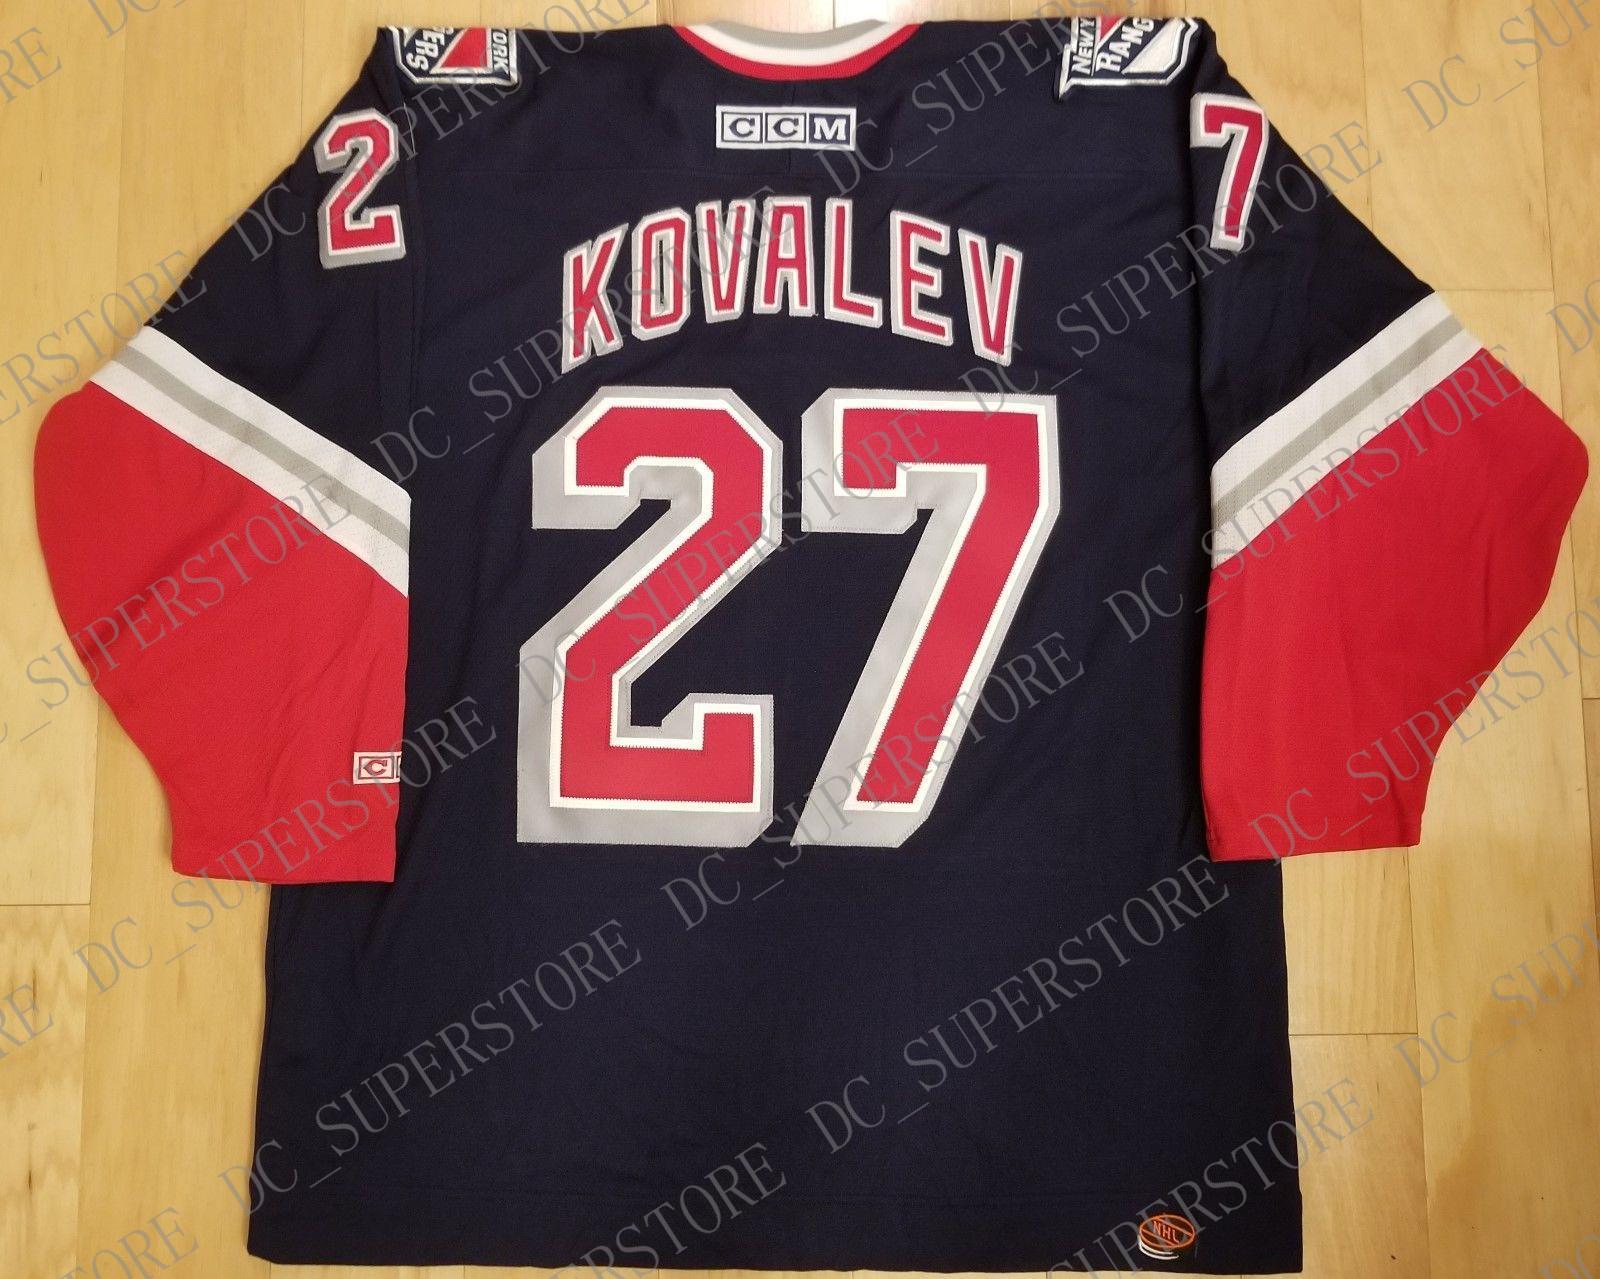 00de833202d 2019 Cheap Custom Alex Kovalev Vintage New York Rangers CCM Third Jersey  Lady Liberty Stitched Retro Hockey Jersey XS 5XL From Dc_superstore, ...